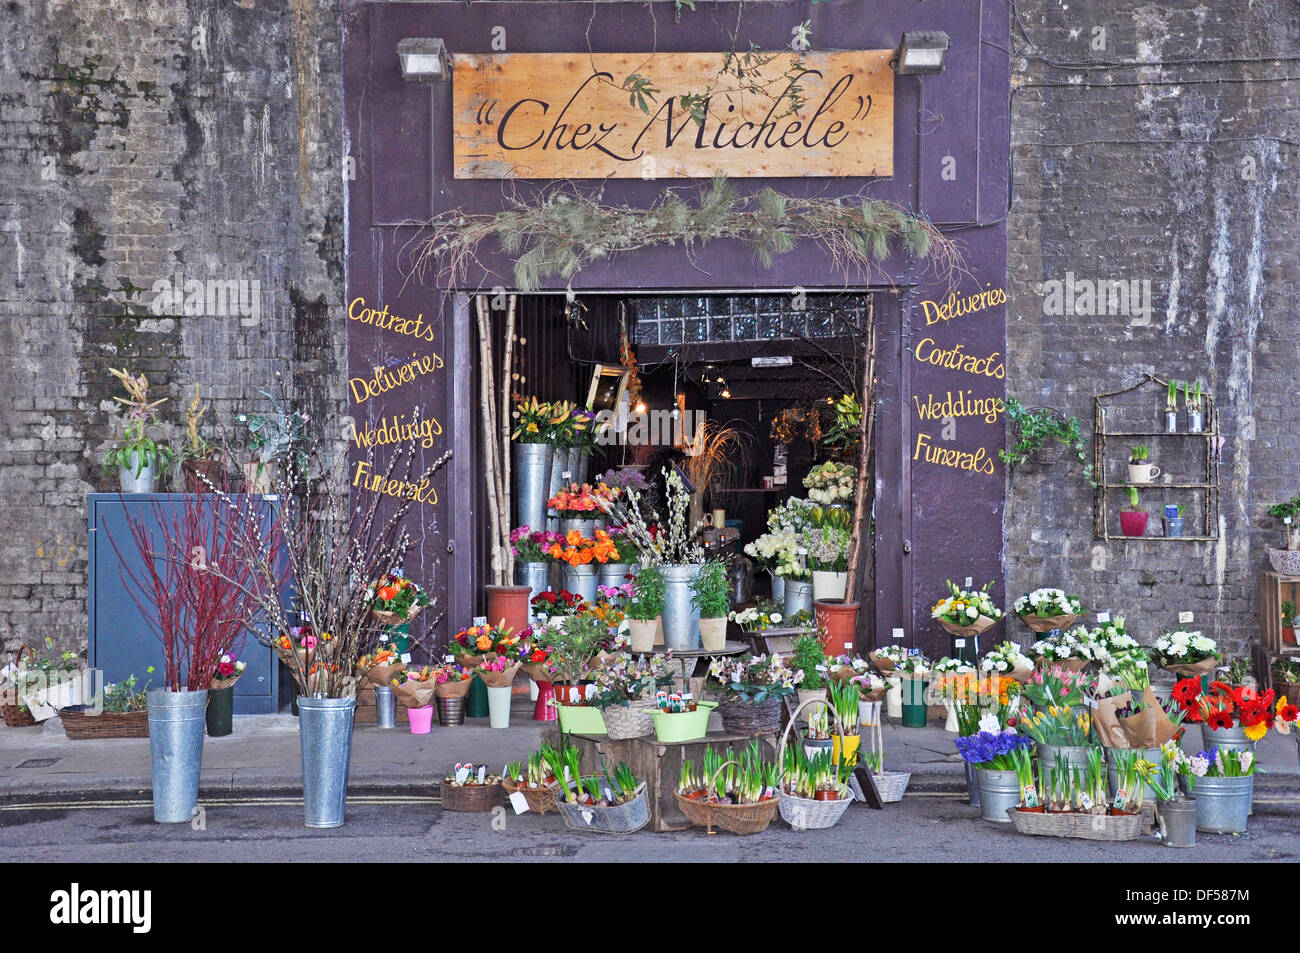 'Chez Michele' flower shop, directly opposite Borough Market (London's renowned food market). England, UK. - Stock Image